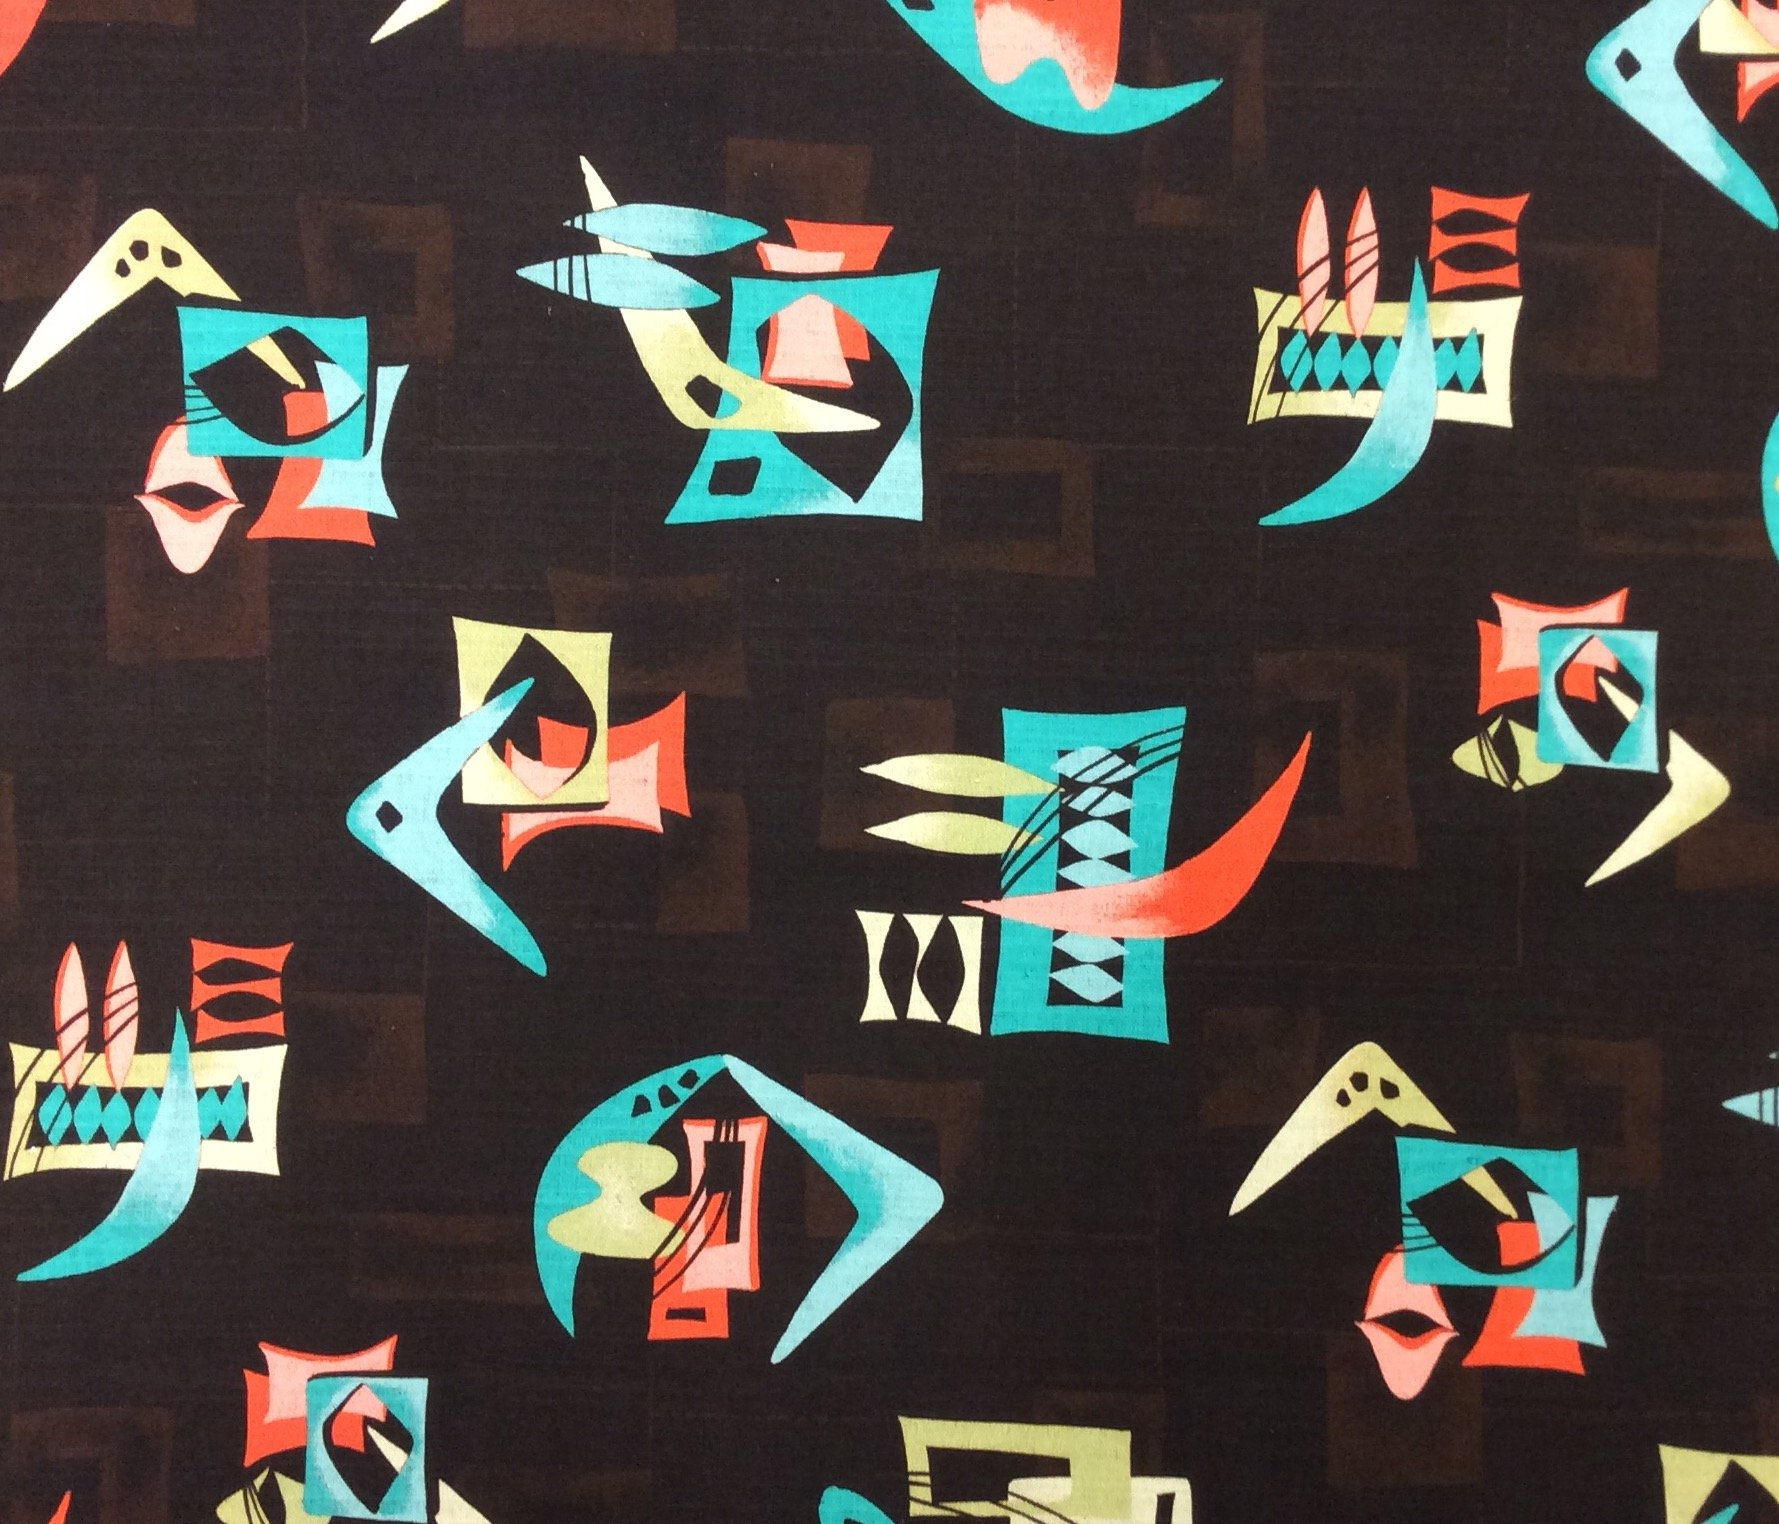 Atomic Retro Mid Century Modern Boomerang Sputnik Space Age MCM Cotton Fabric Light Weight Canvas HM27